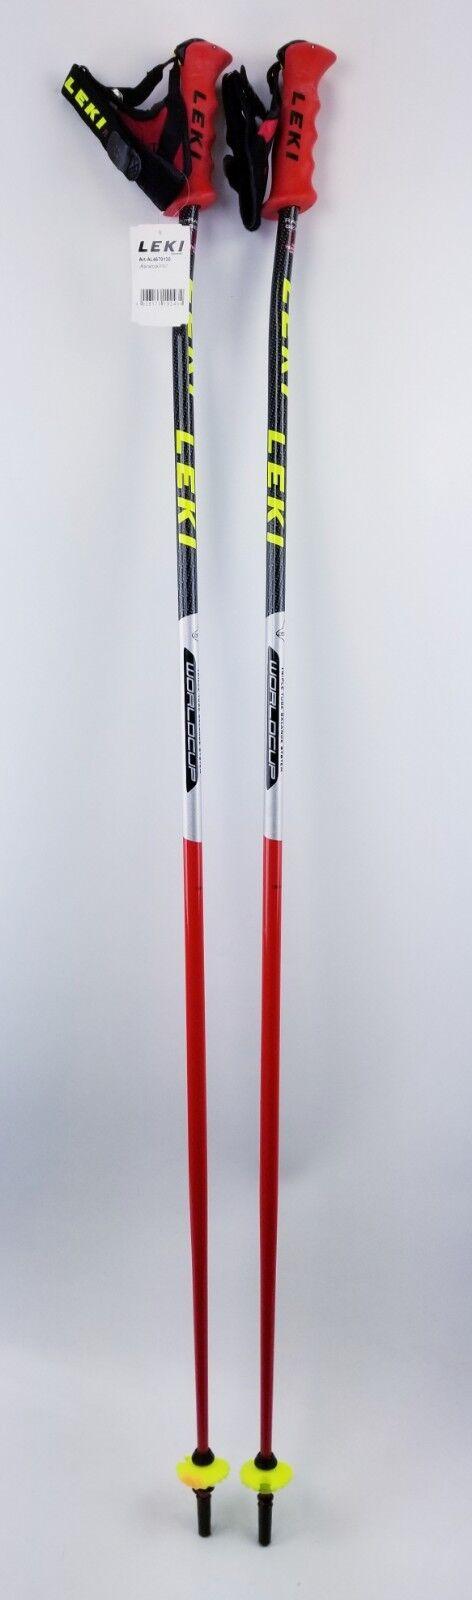 NEW  250 LEKI World Cup Racing Ski Poles  130CM 52  Downhill Skiing  good price